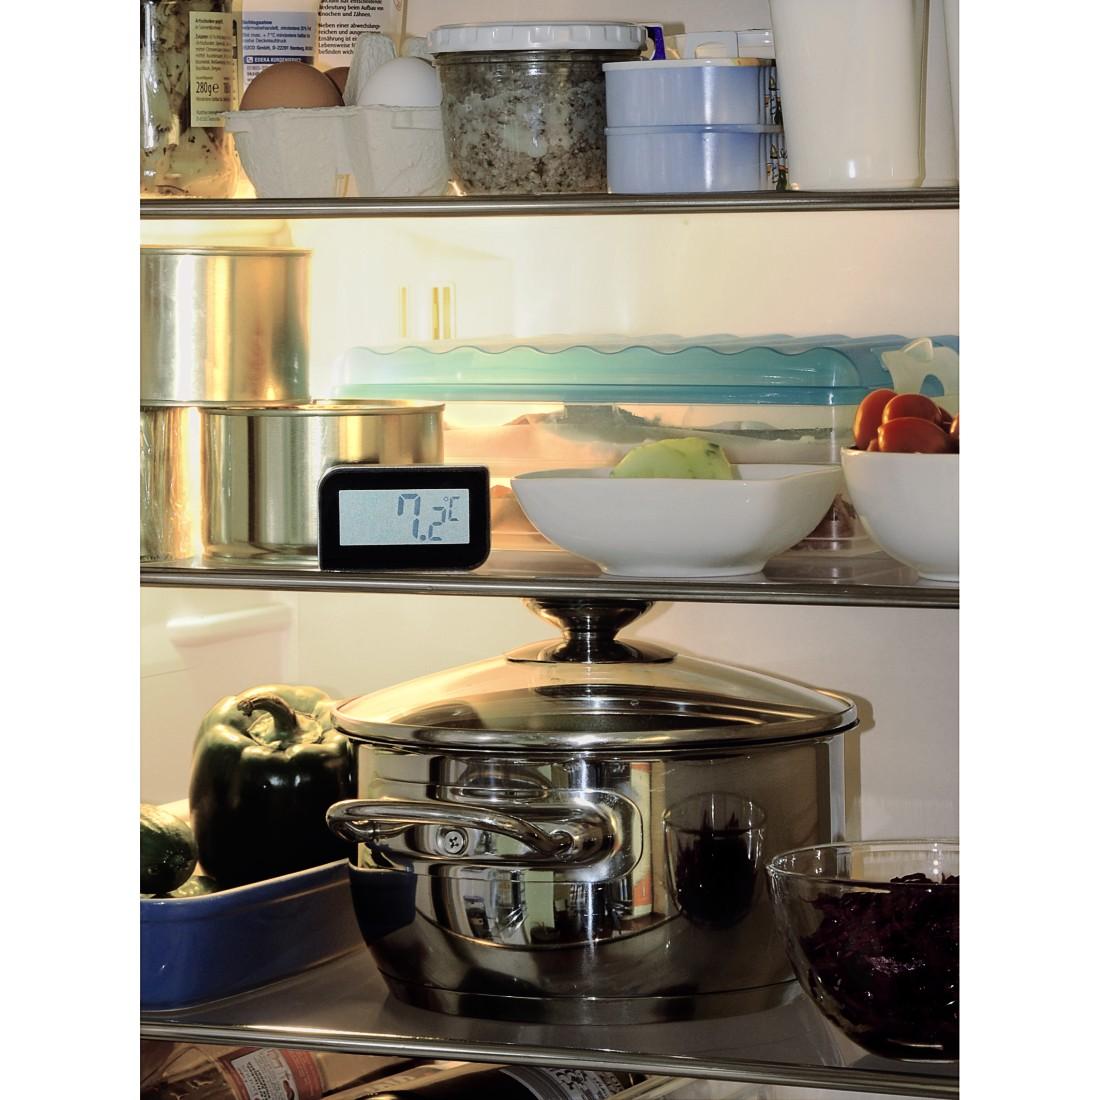 00111357 xavax digitales k hl. Black Bedroom Furniture Sets. Home Design Ideas